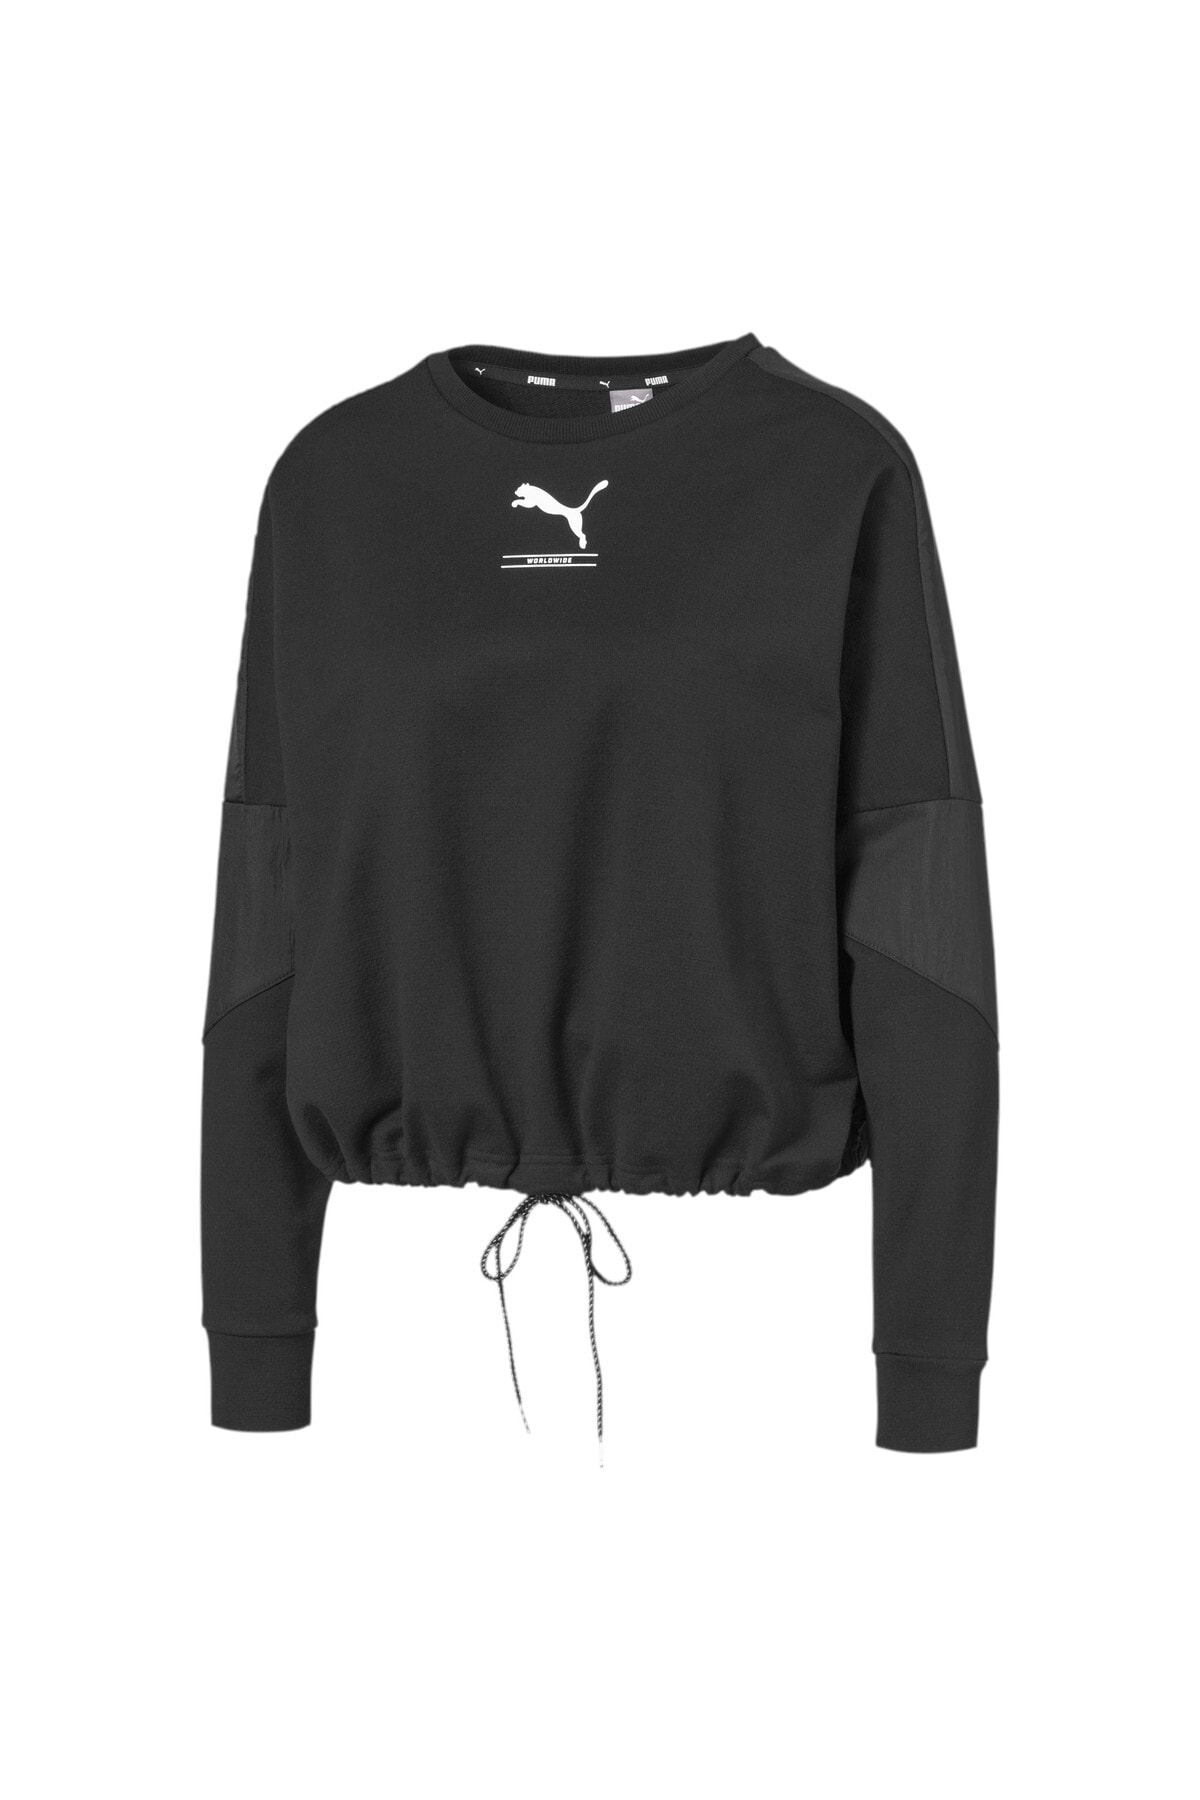 Puma Kadın Spor Sweatshirt - NU-TILITY - 58137801 0